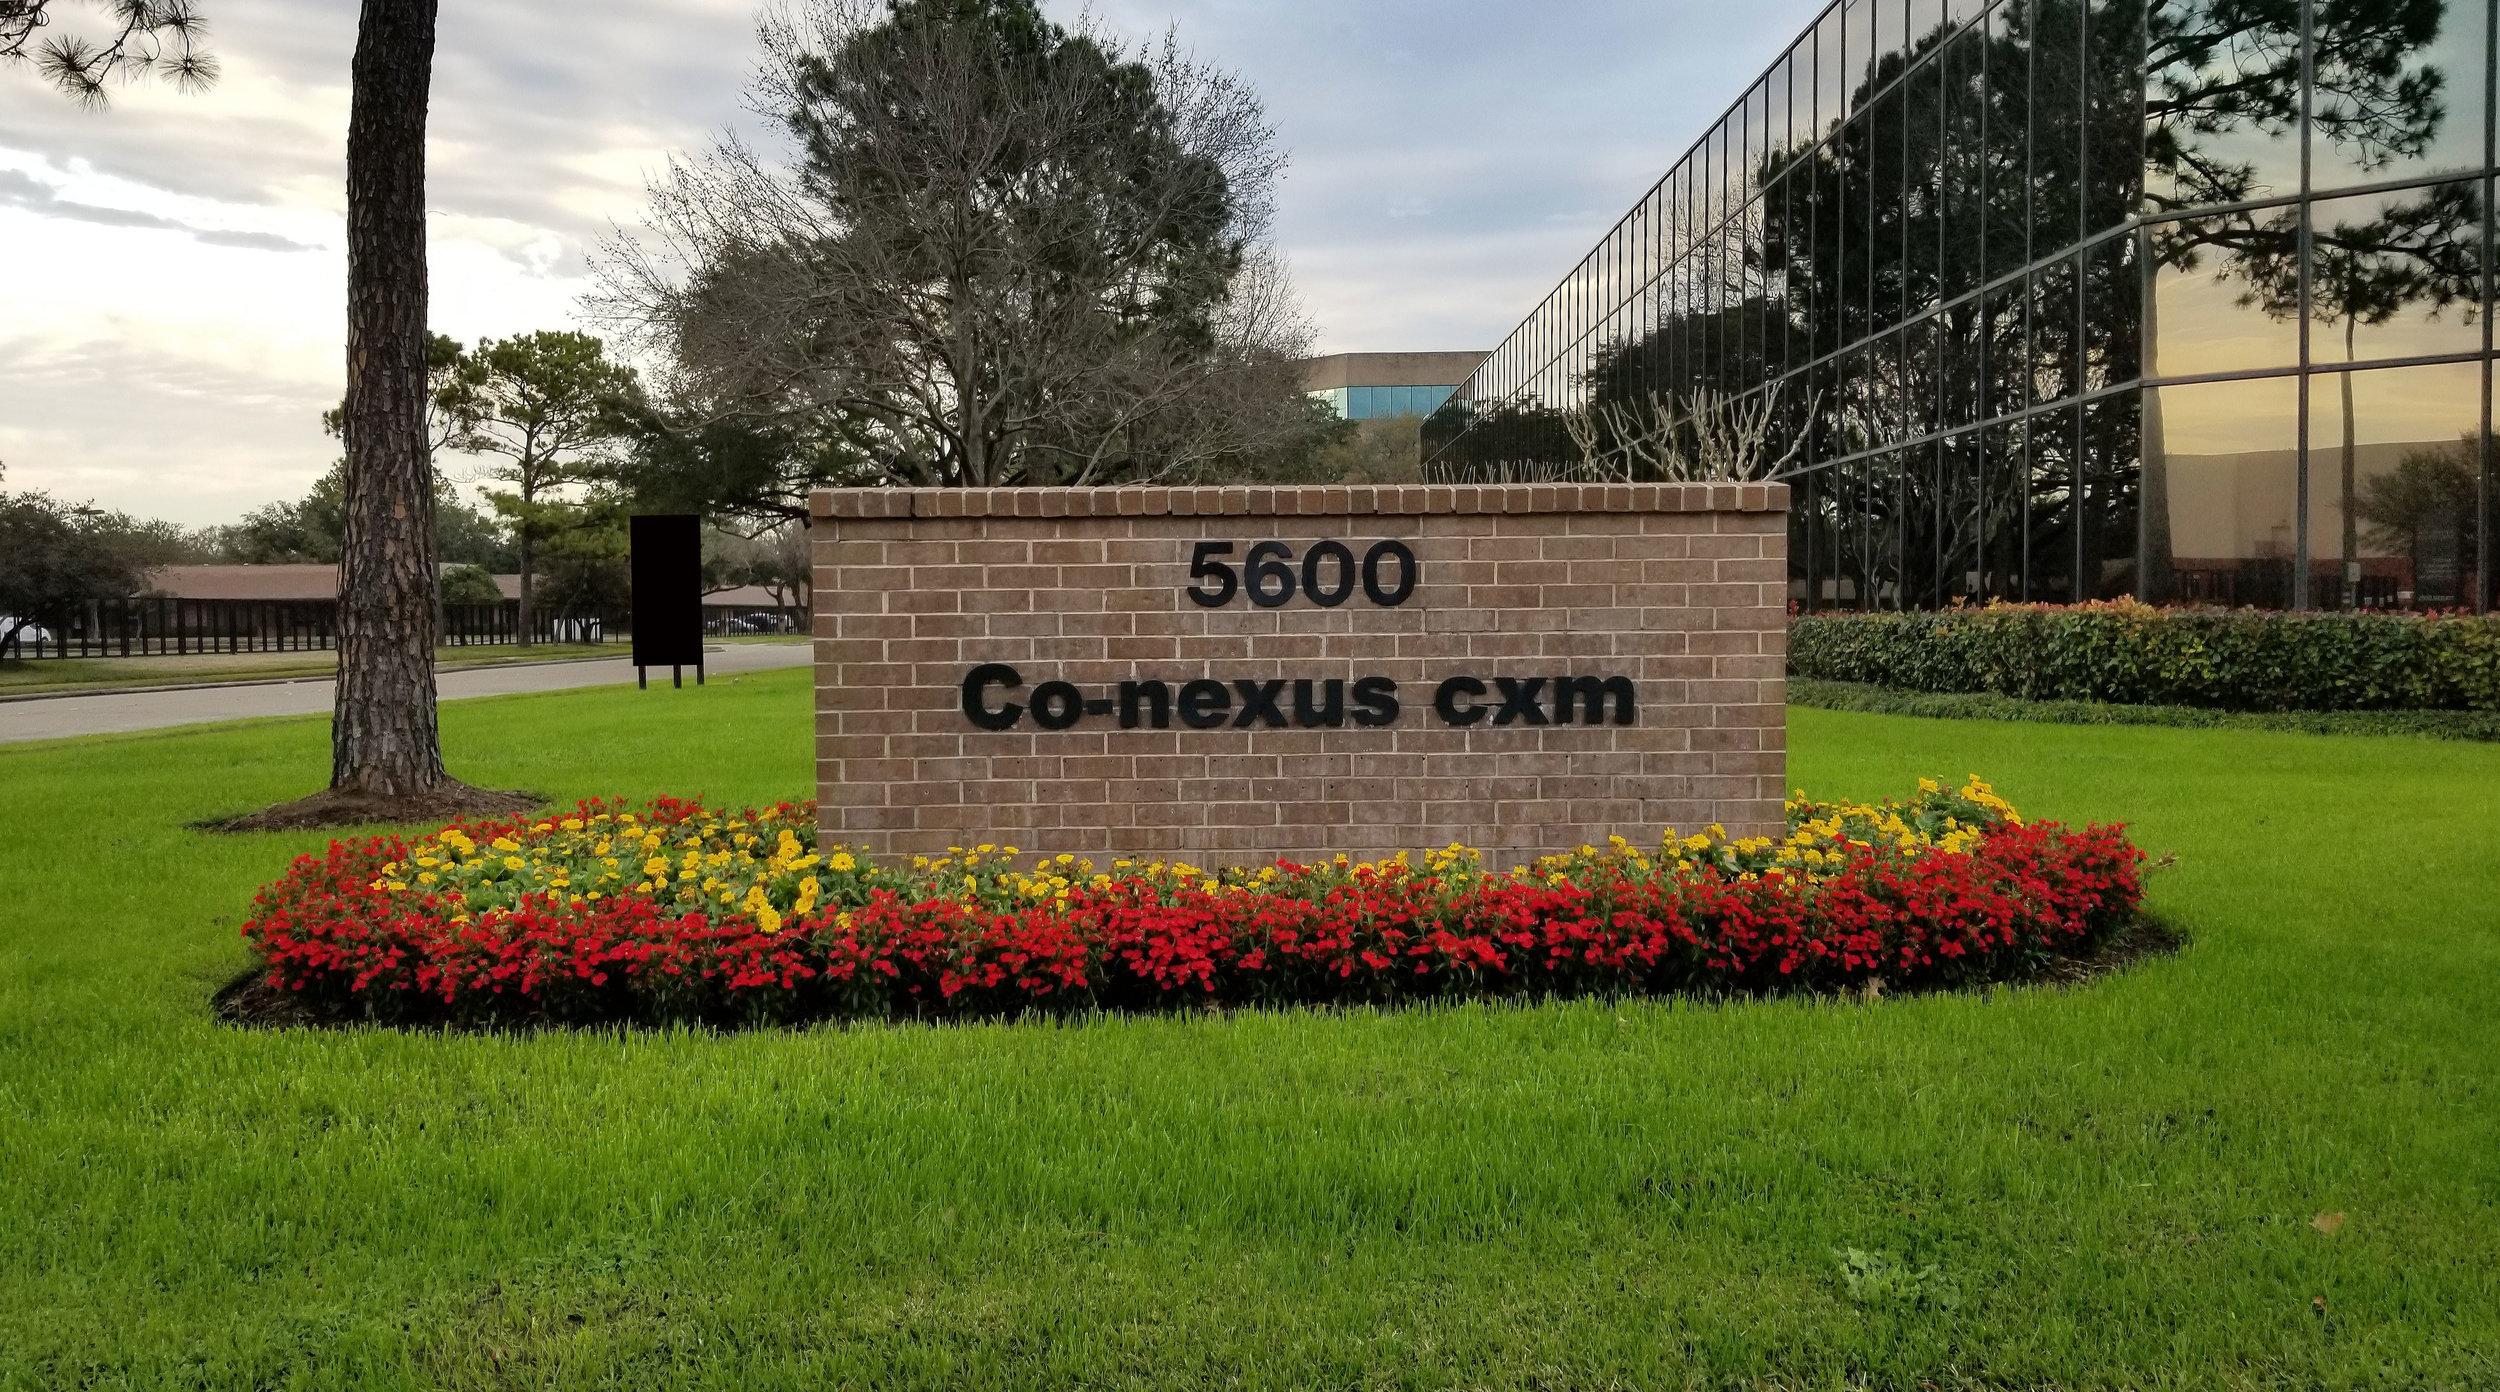 Rev-Co-nexus-Exterior-Office-1.jpg